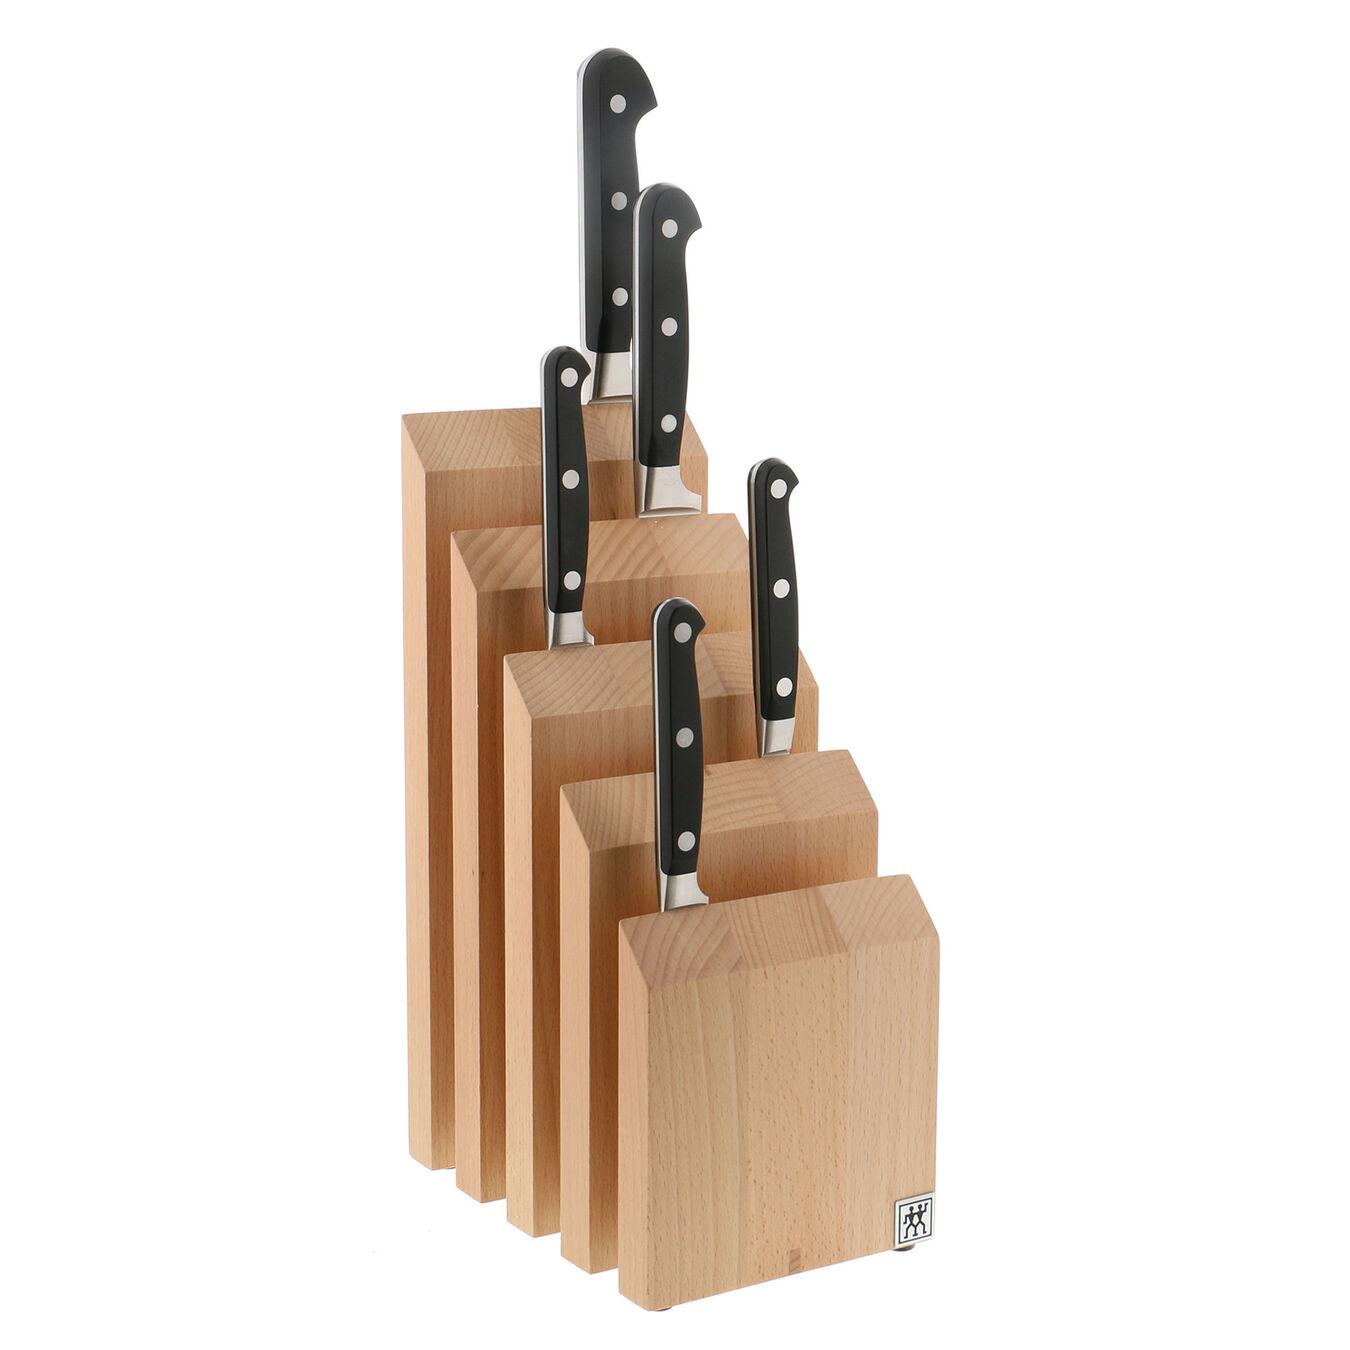 Beechwood, Upright Italian Magnetic Block - Natural,,large 2